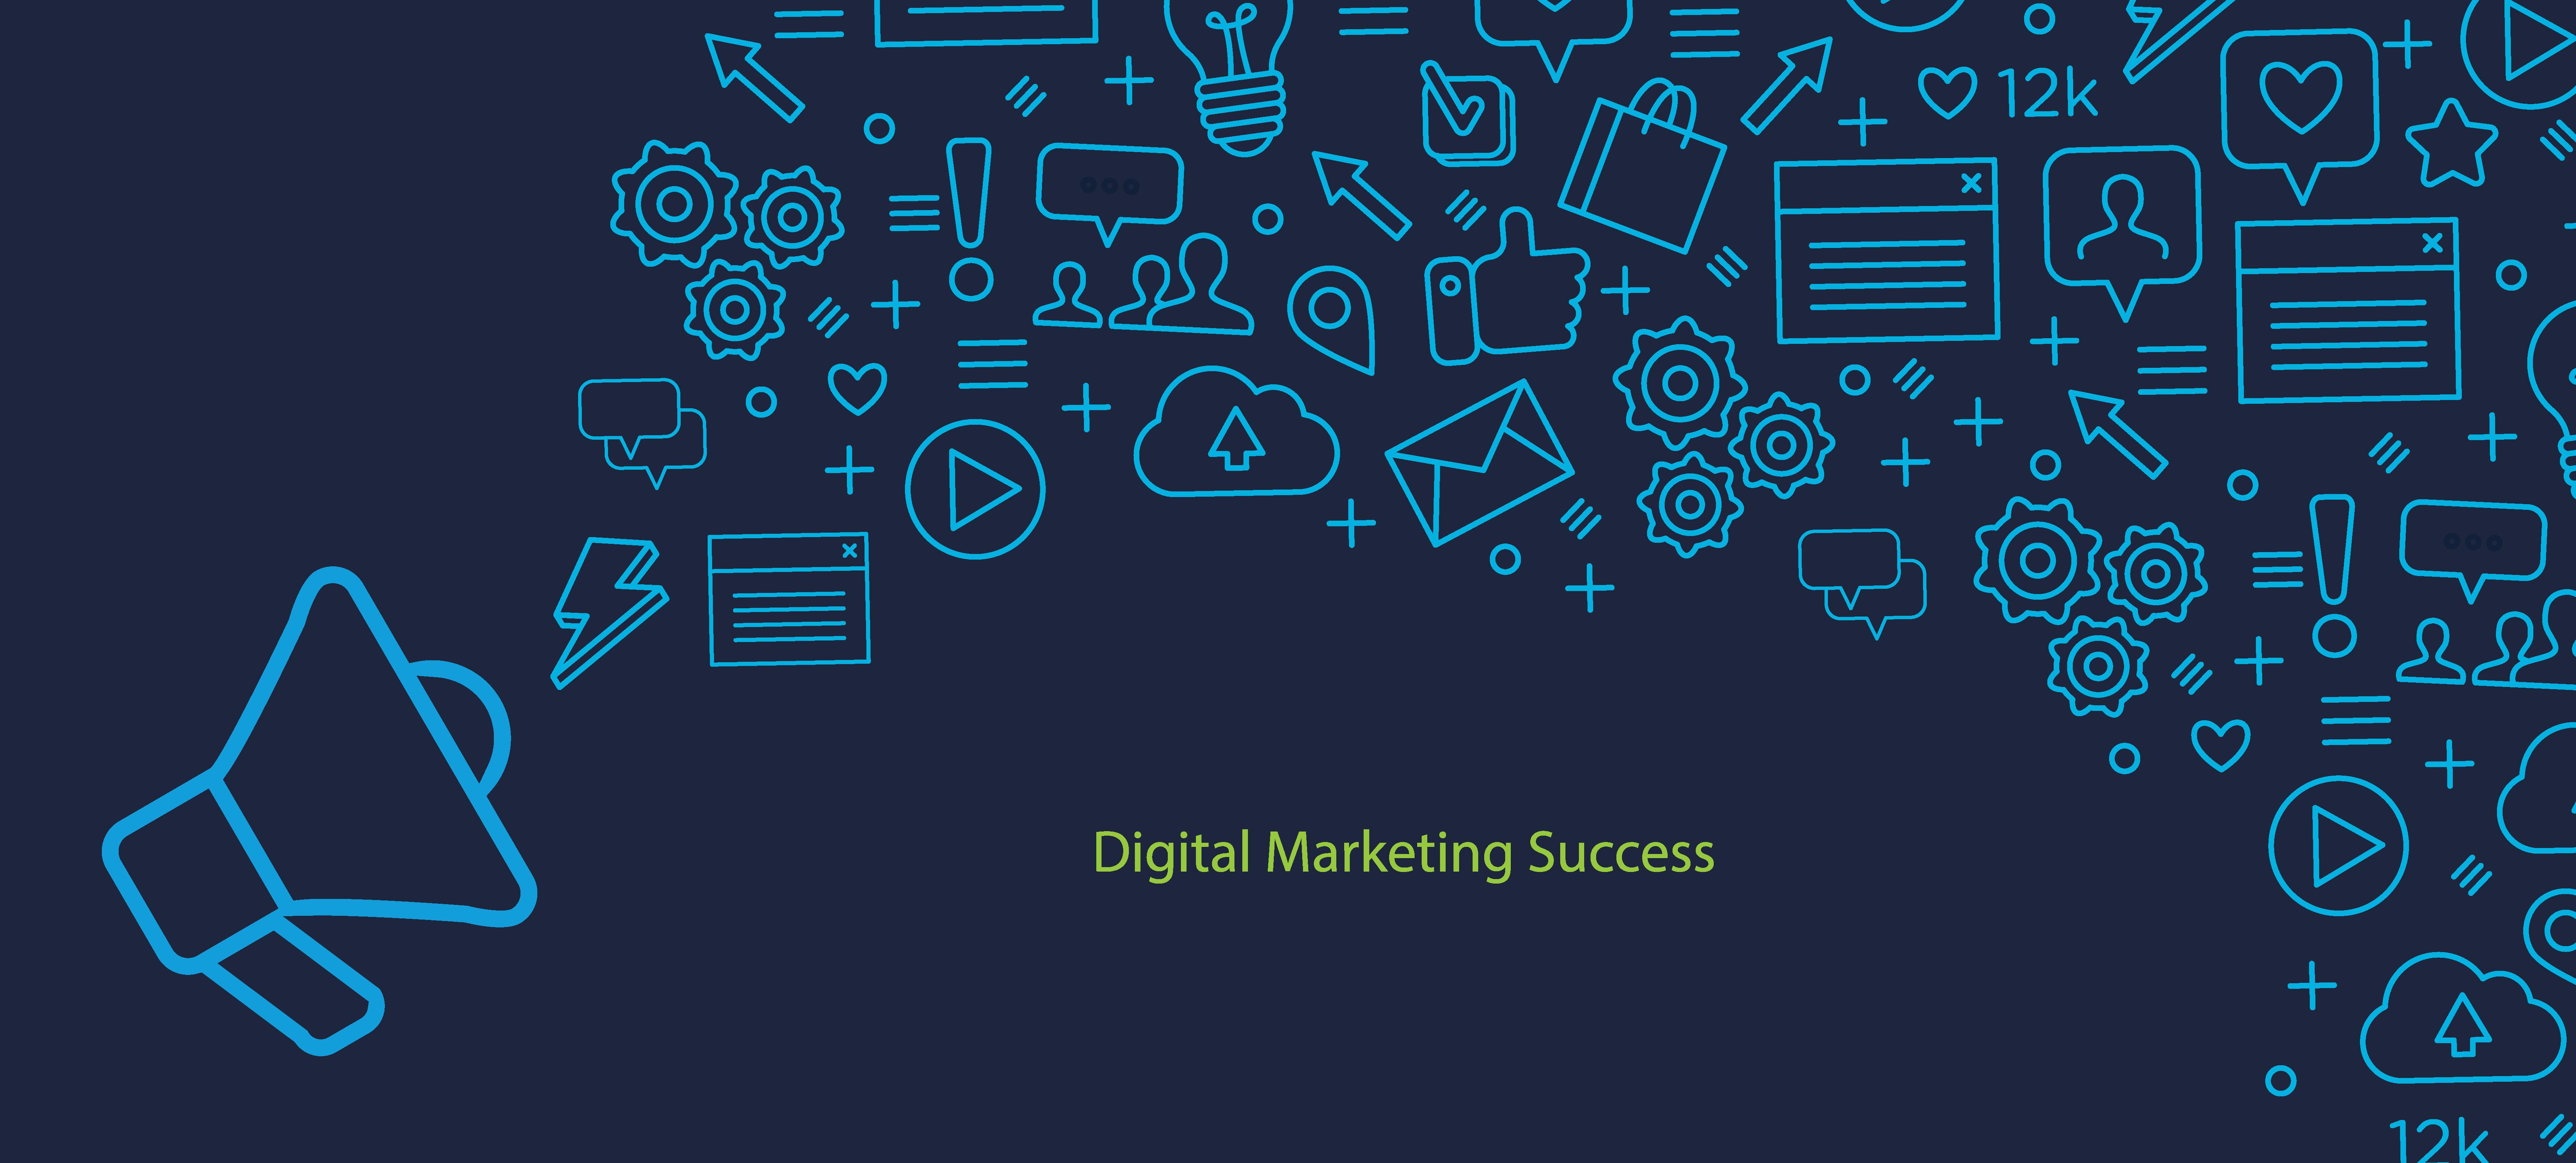 digital-Marketing-Success-01